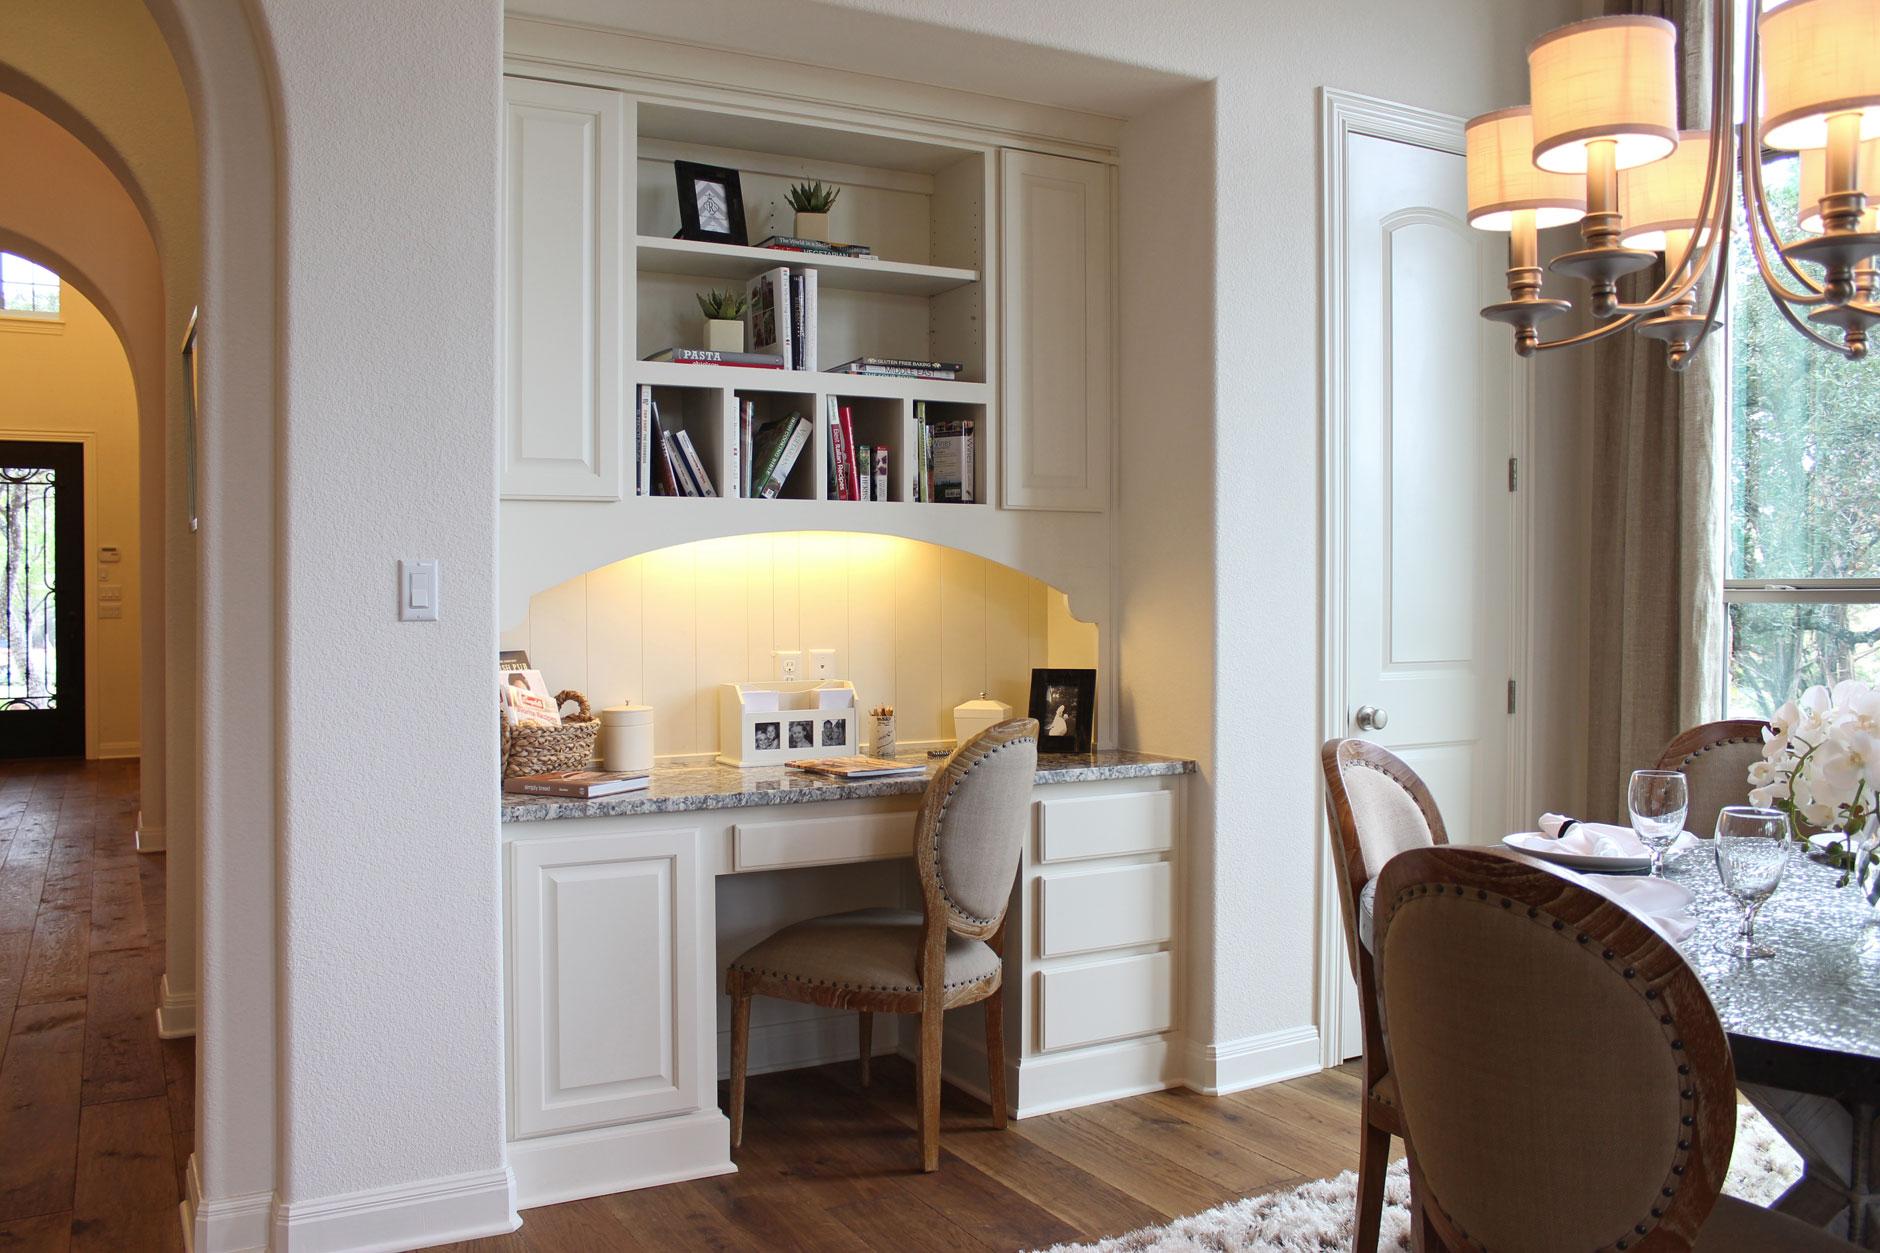 Breakfast room built-in desk with cubbies - raised panel doors by TaylorCraft Cabinet Door Company